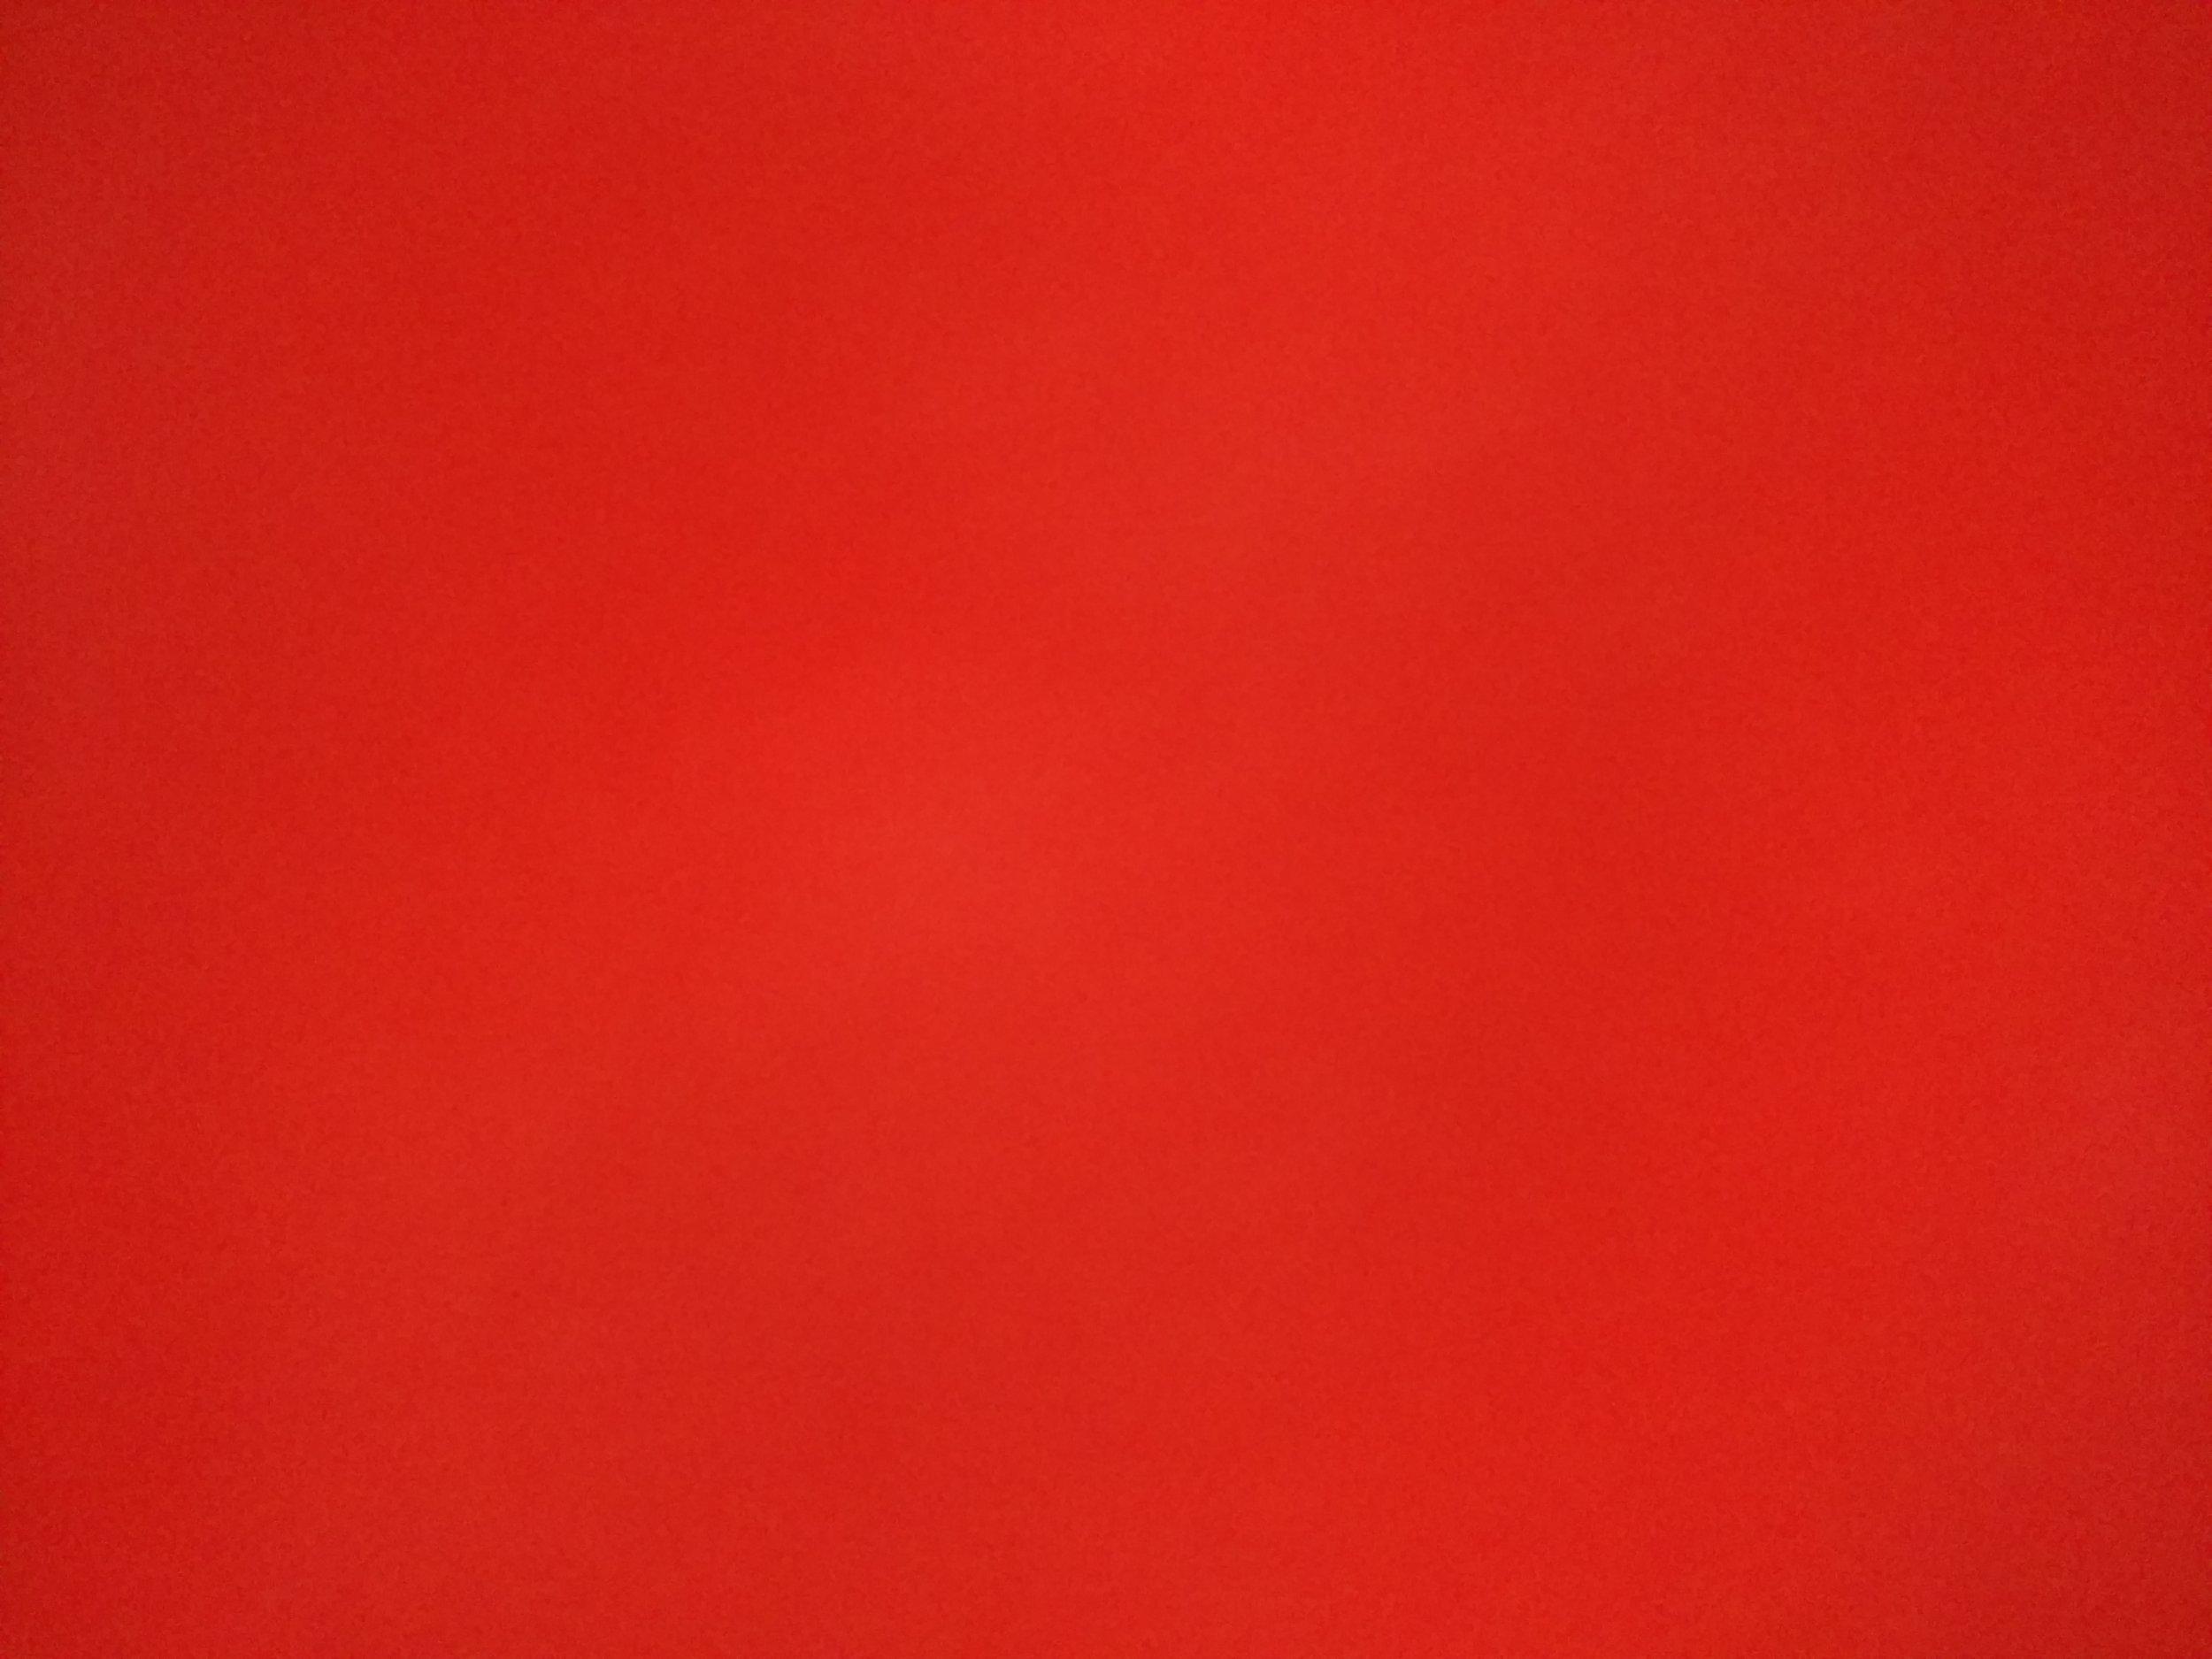 willroth-co-free-texture-gradient-024.jpg